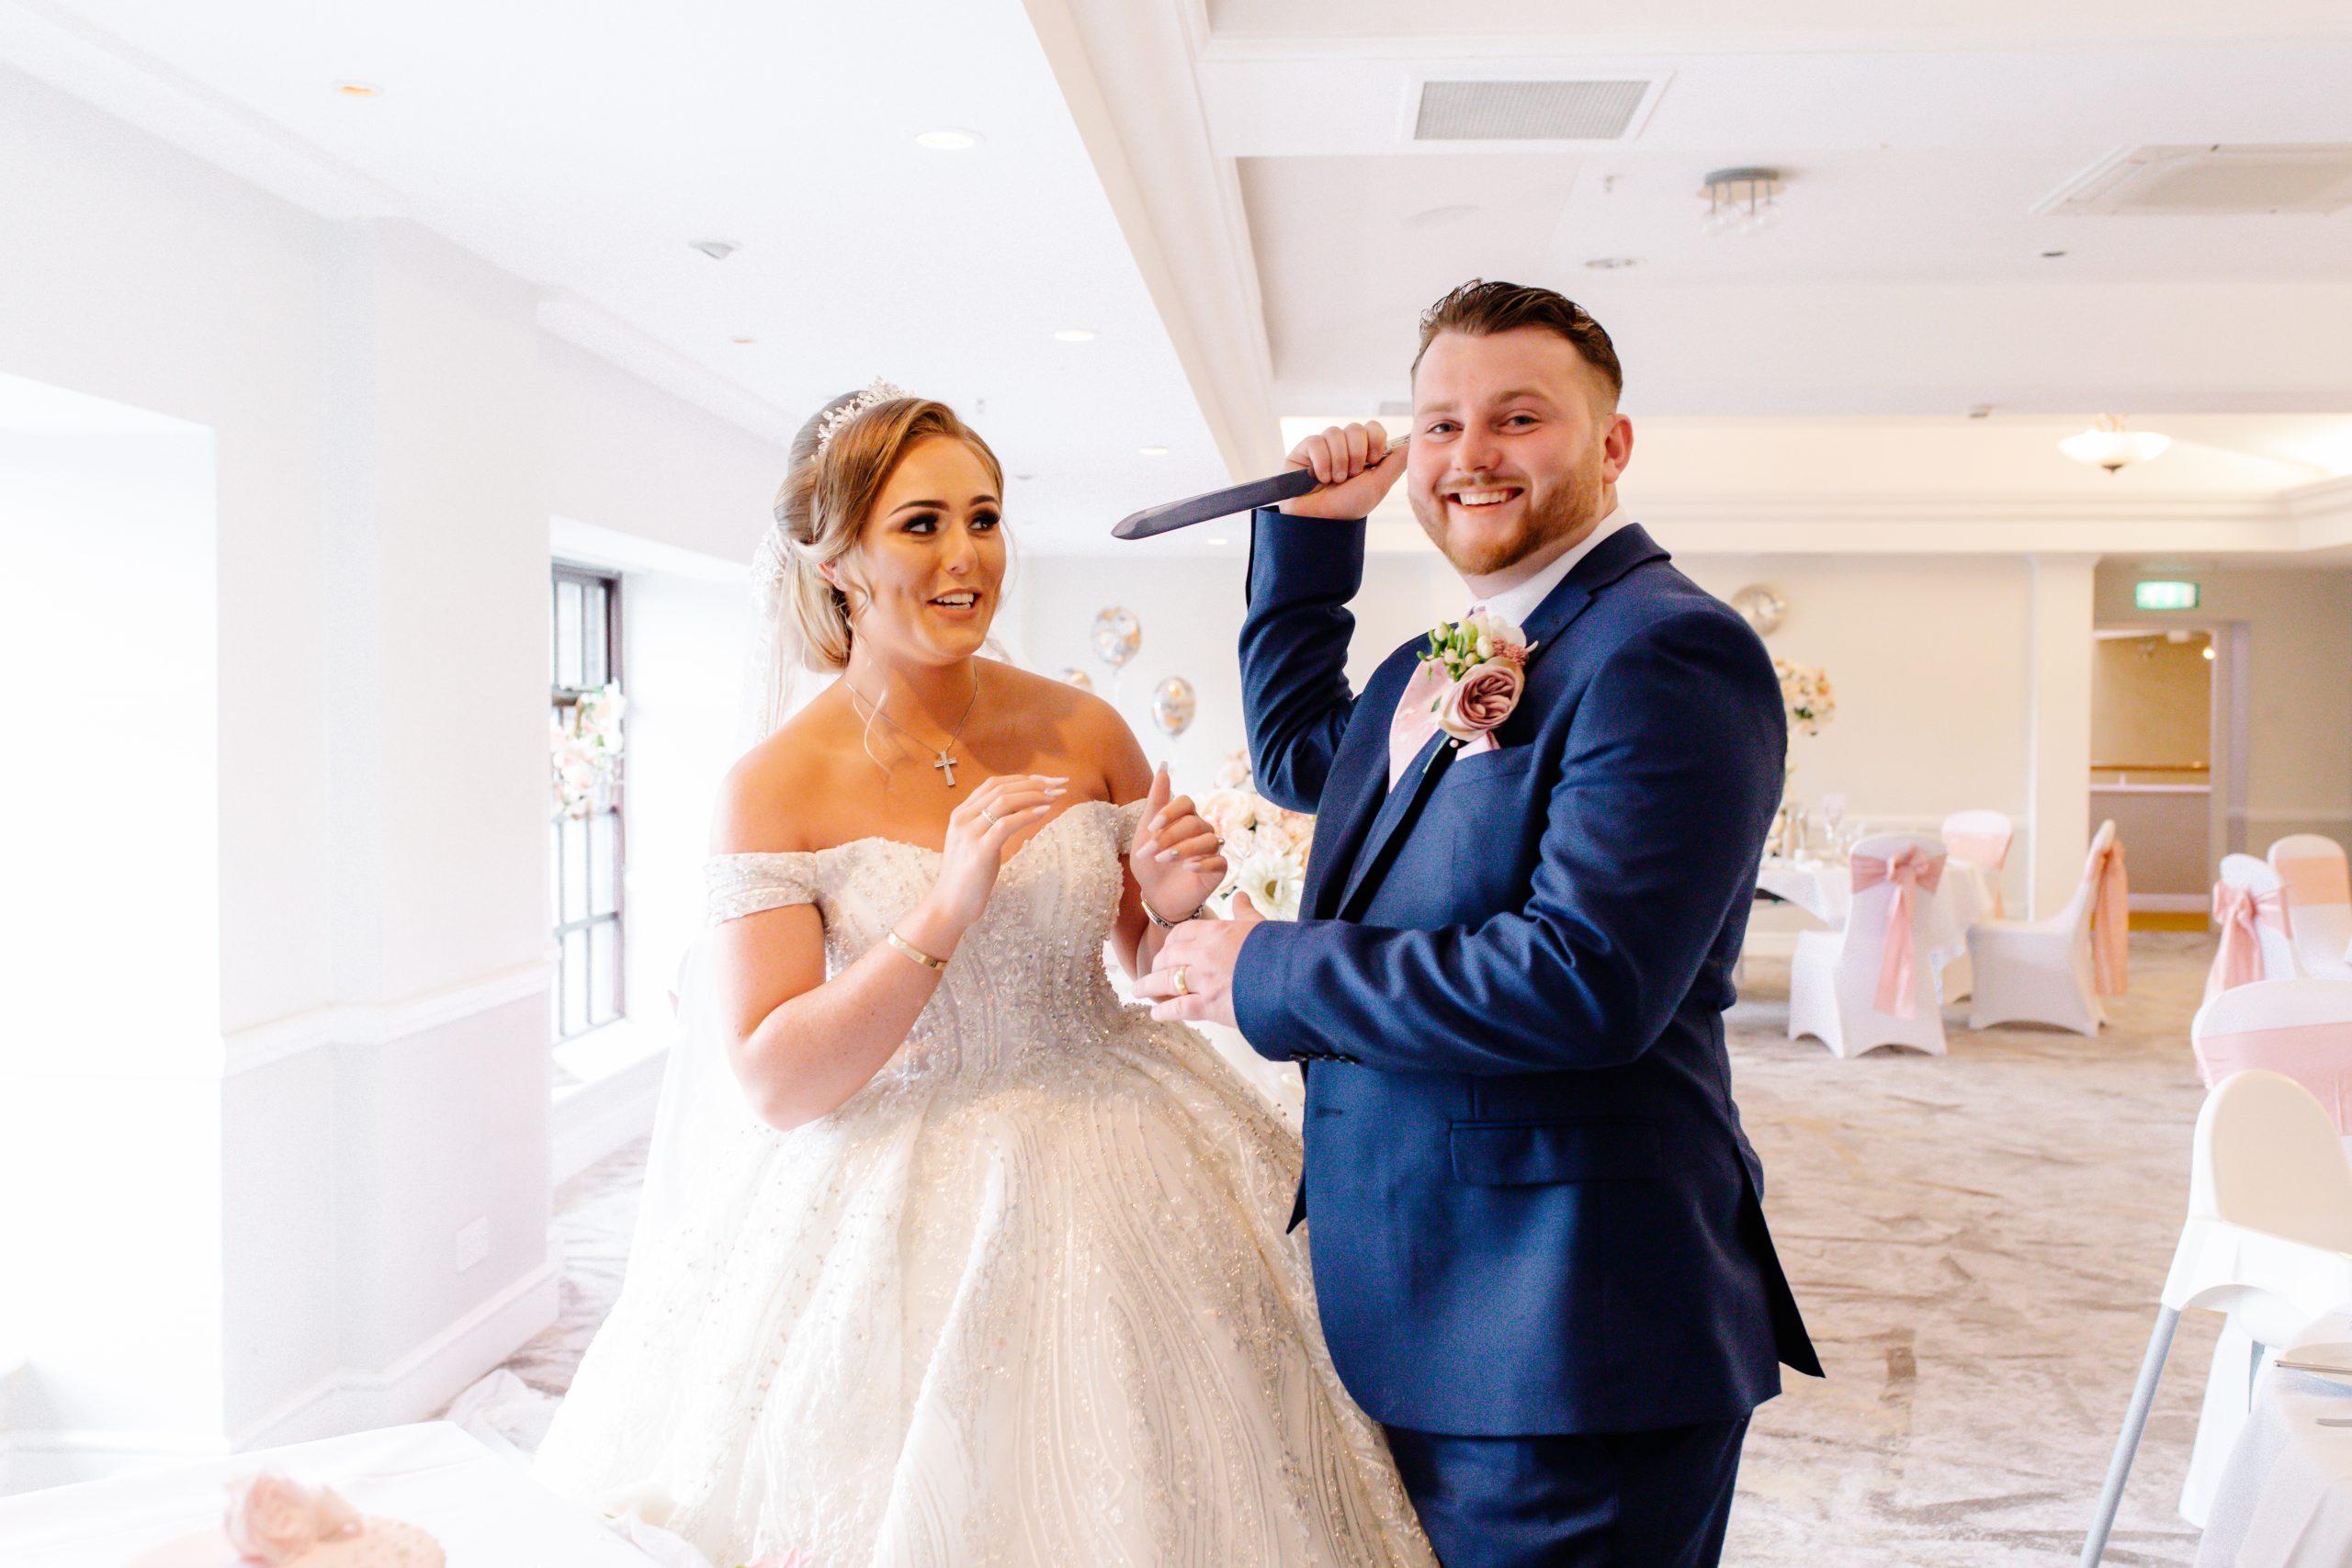 Marriott Hotel Wedding - Emma Lowe Wedding Photography 2021